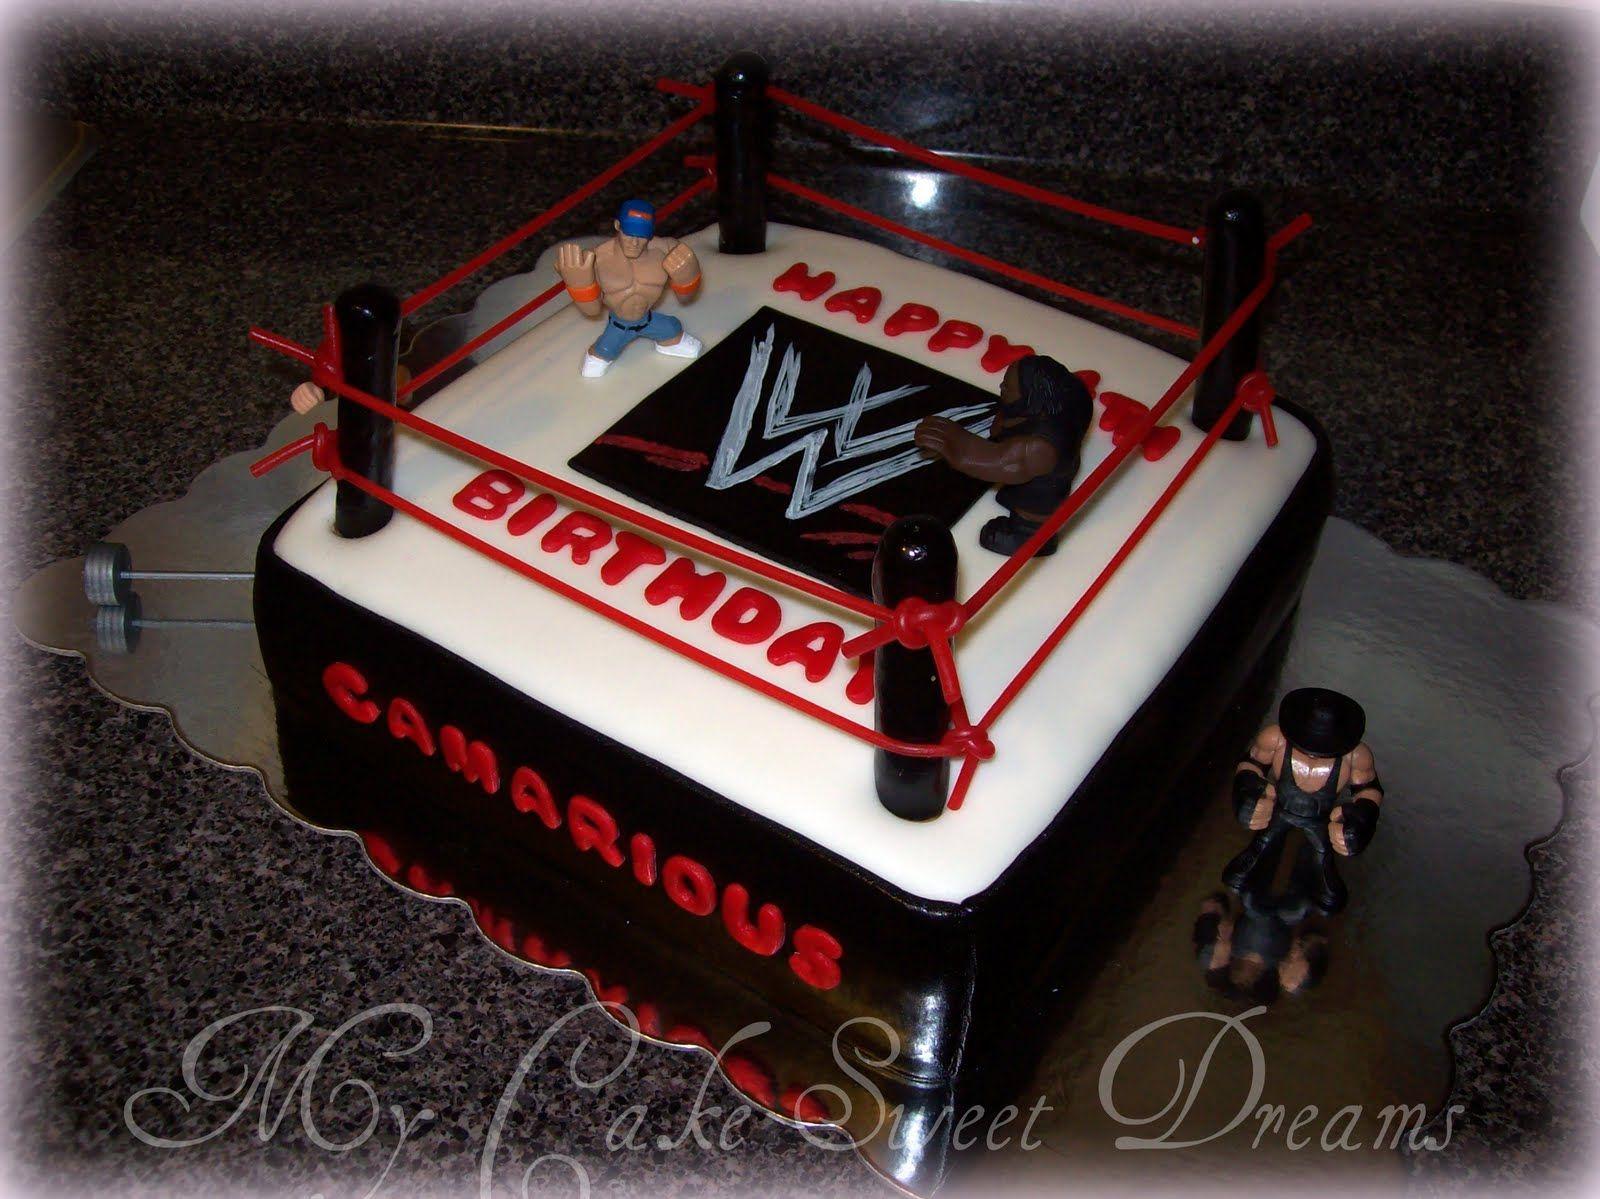 Wwe Wrestling Birthday Cake Hot Girl Hd Wallpaper